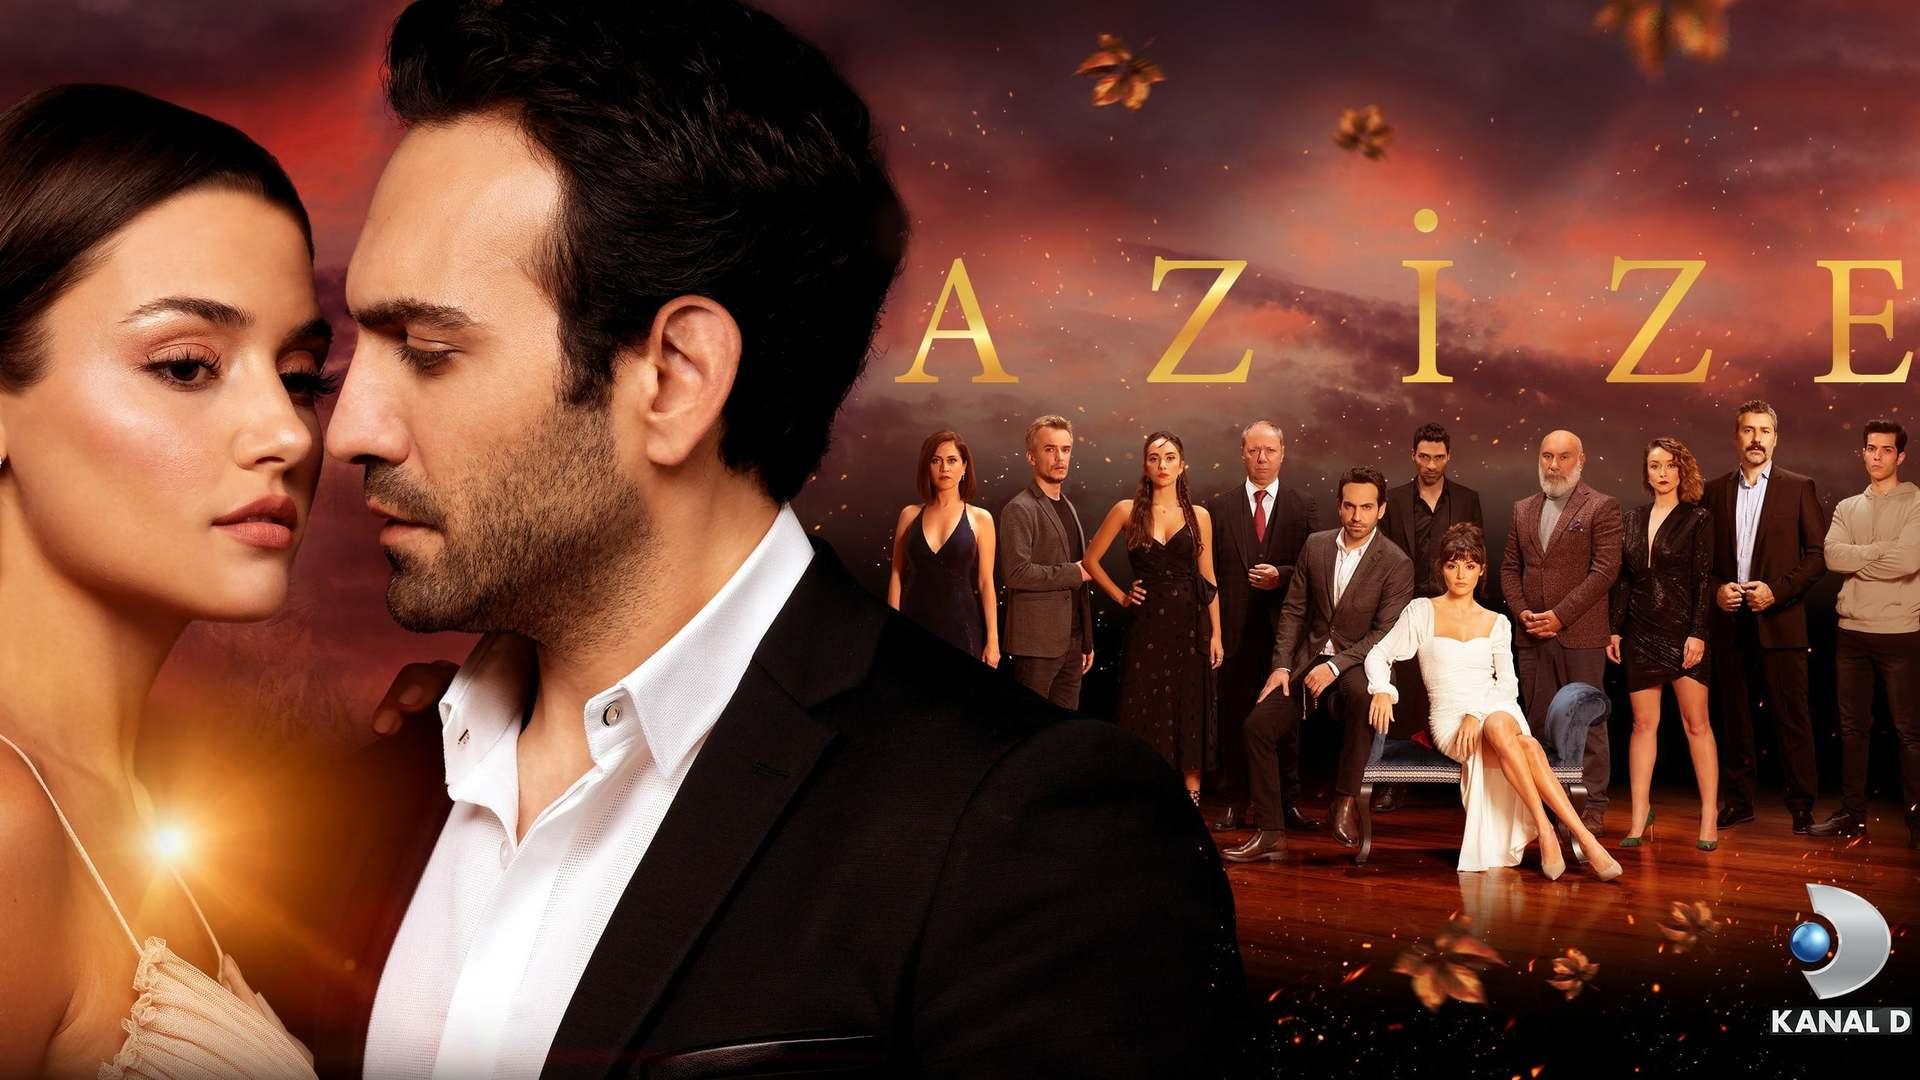 Кадры из фильма Азизе Azize 2019